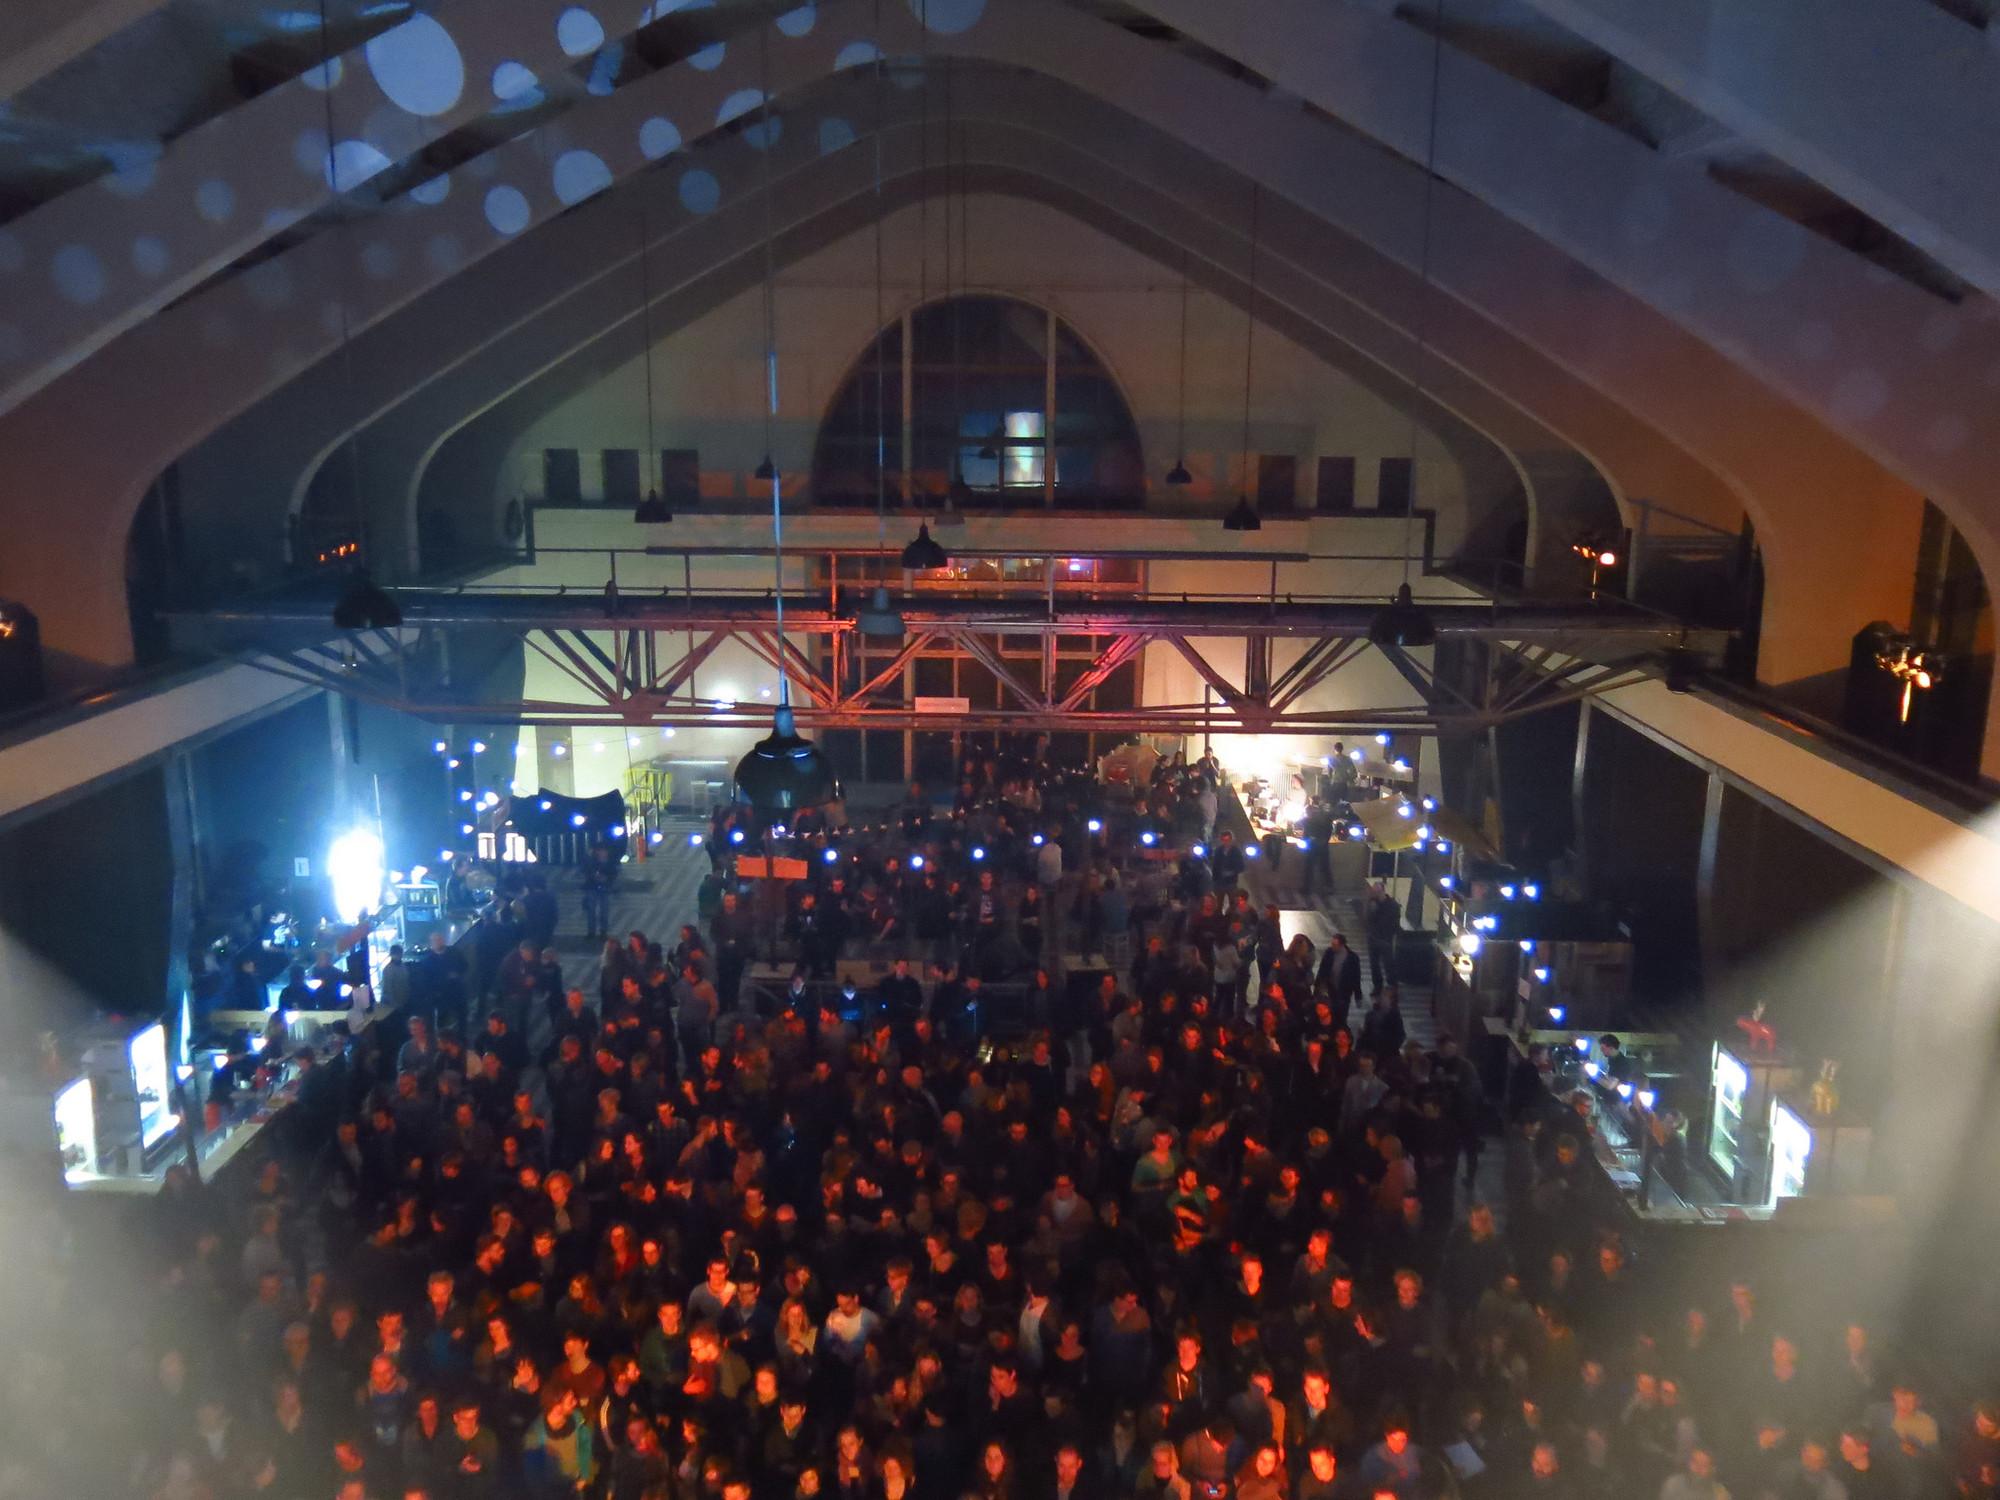 Radio Kootwijk: edificio A, interior reacondicionado para festival Grasnapolsky. Image © Rene Passet [Flickr CC]